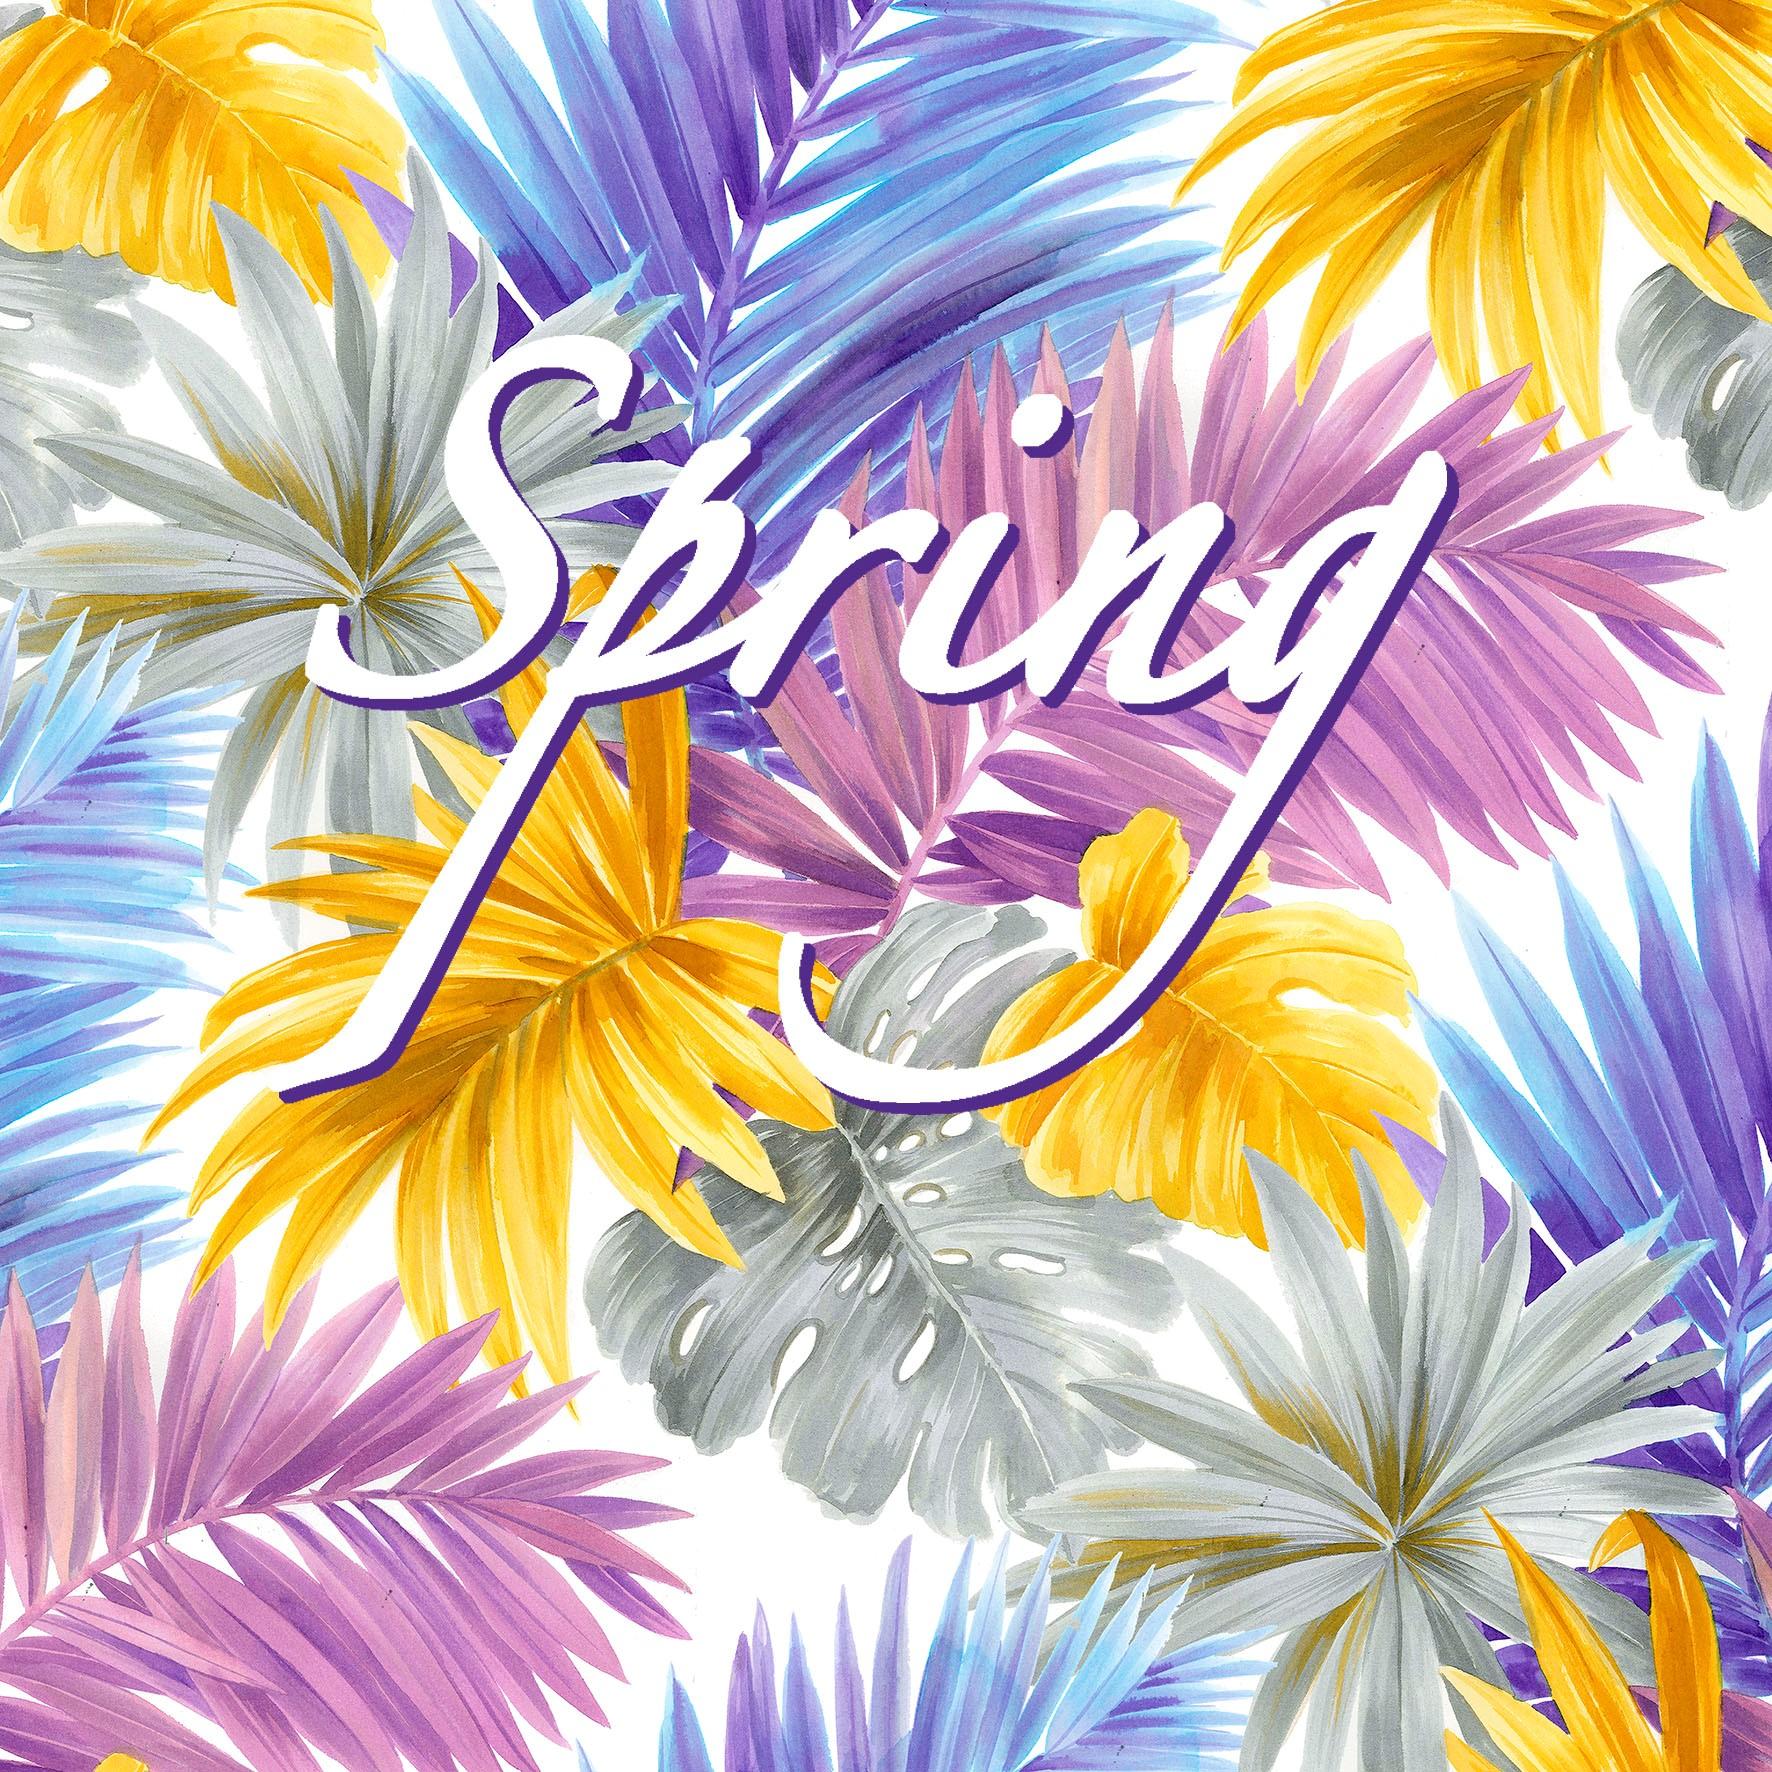 La primavera la moda altera